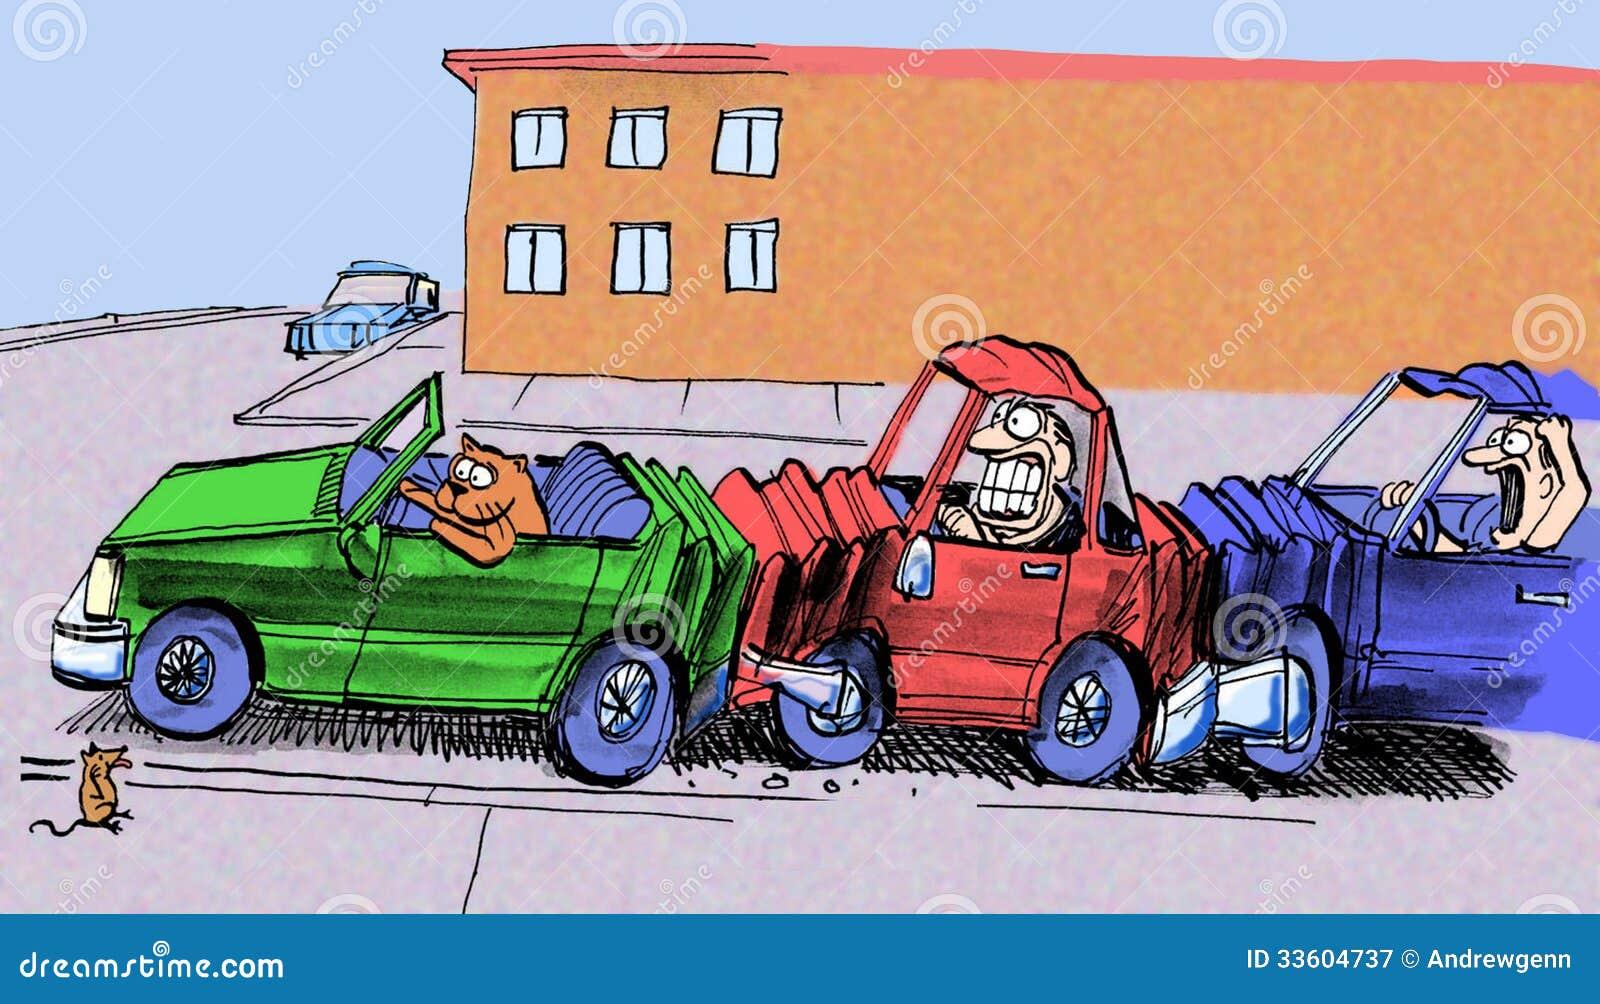 free clipart auto accident - photo #32